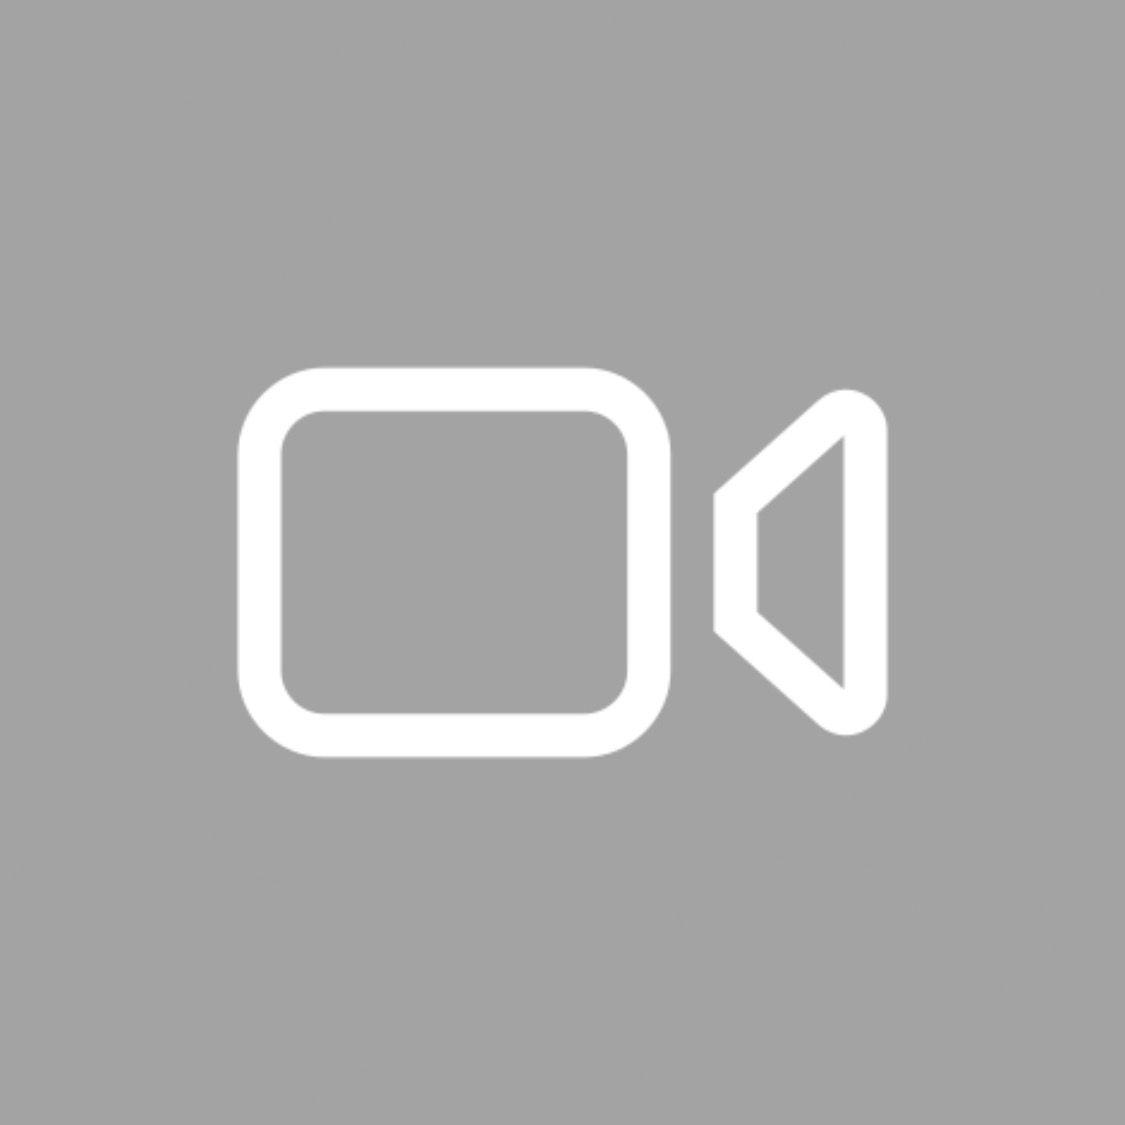 Facetime White App Logo Aesthetic Ios App Icon Design App Logo App Icon